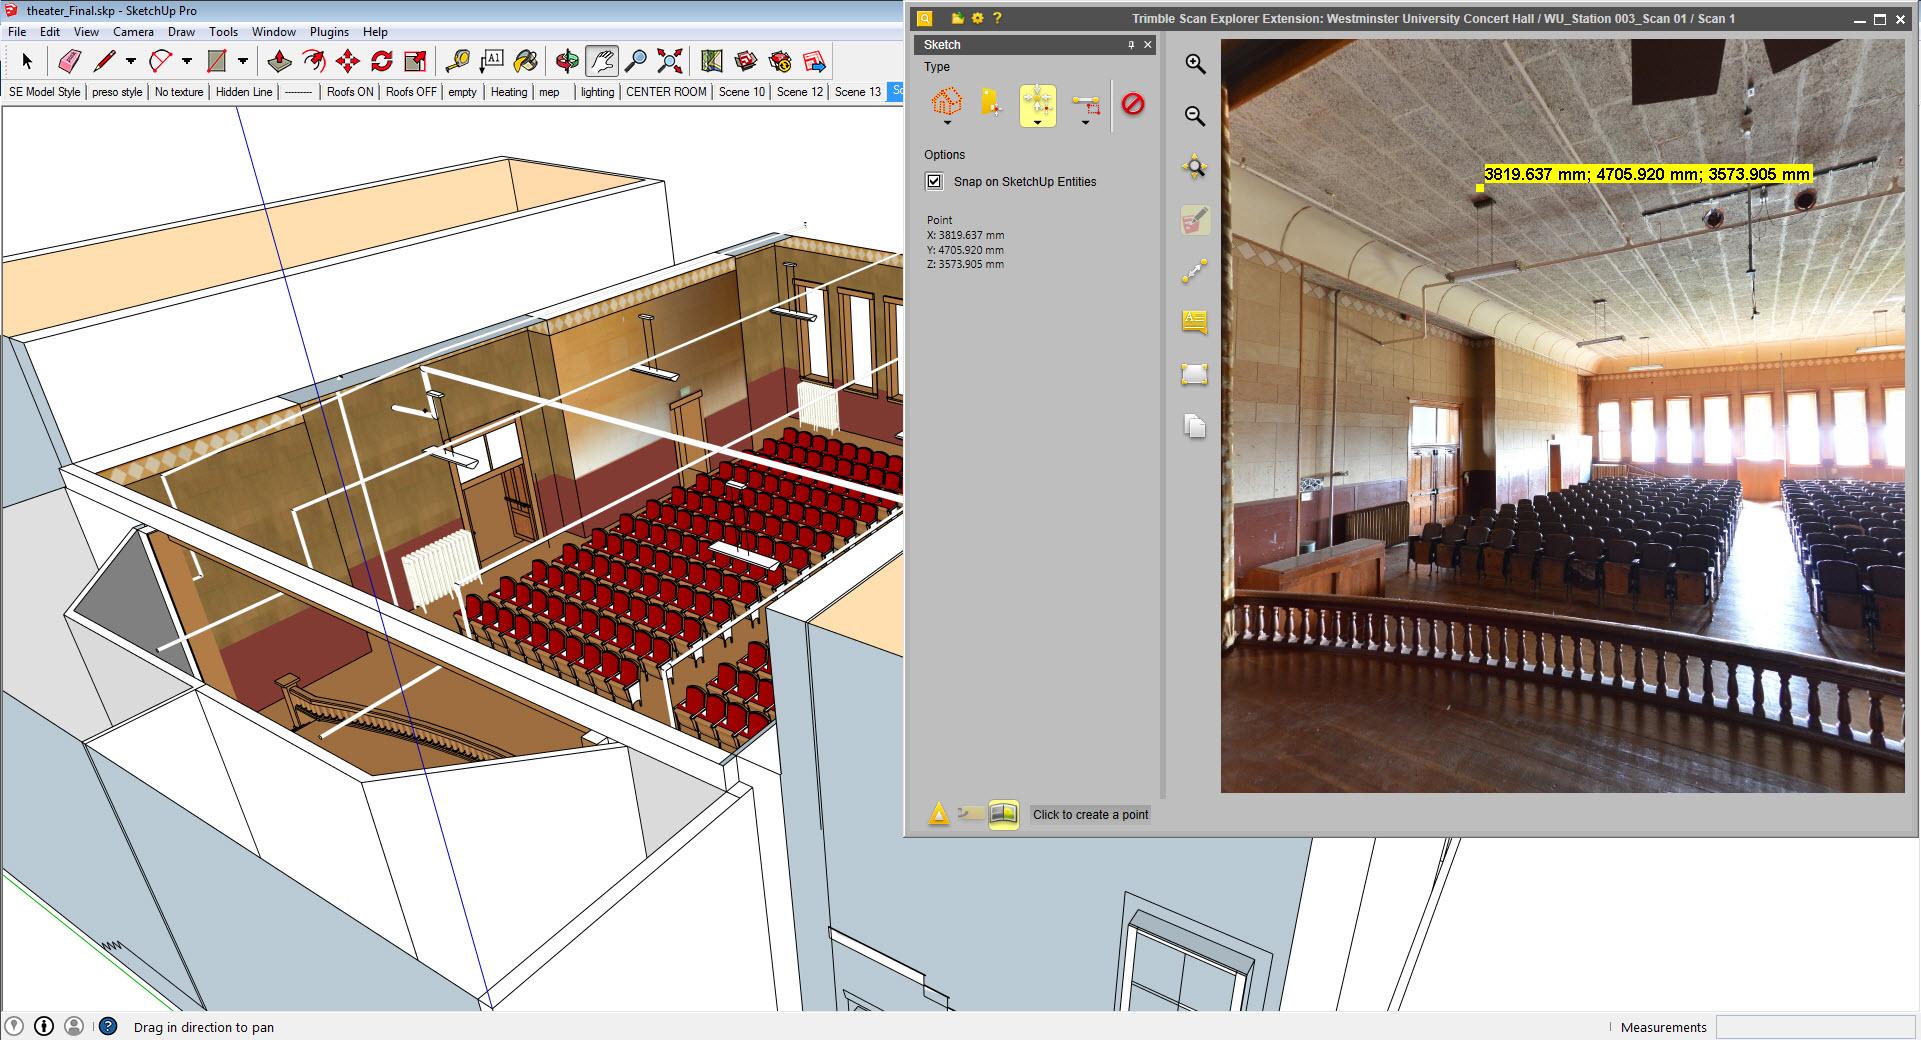 Trimble Scan Explorer Extension Sketchup Extension Warehouse